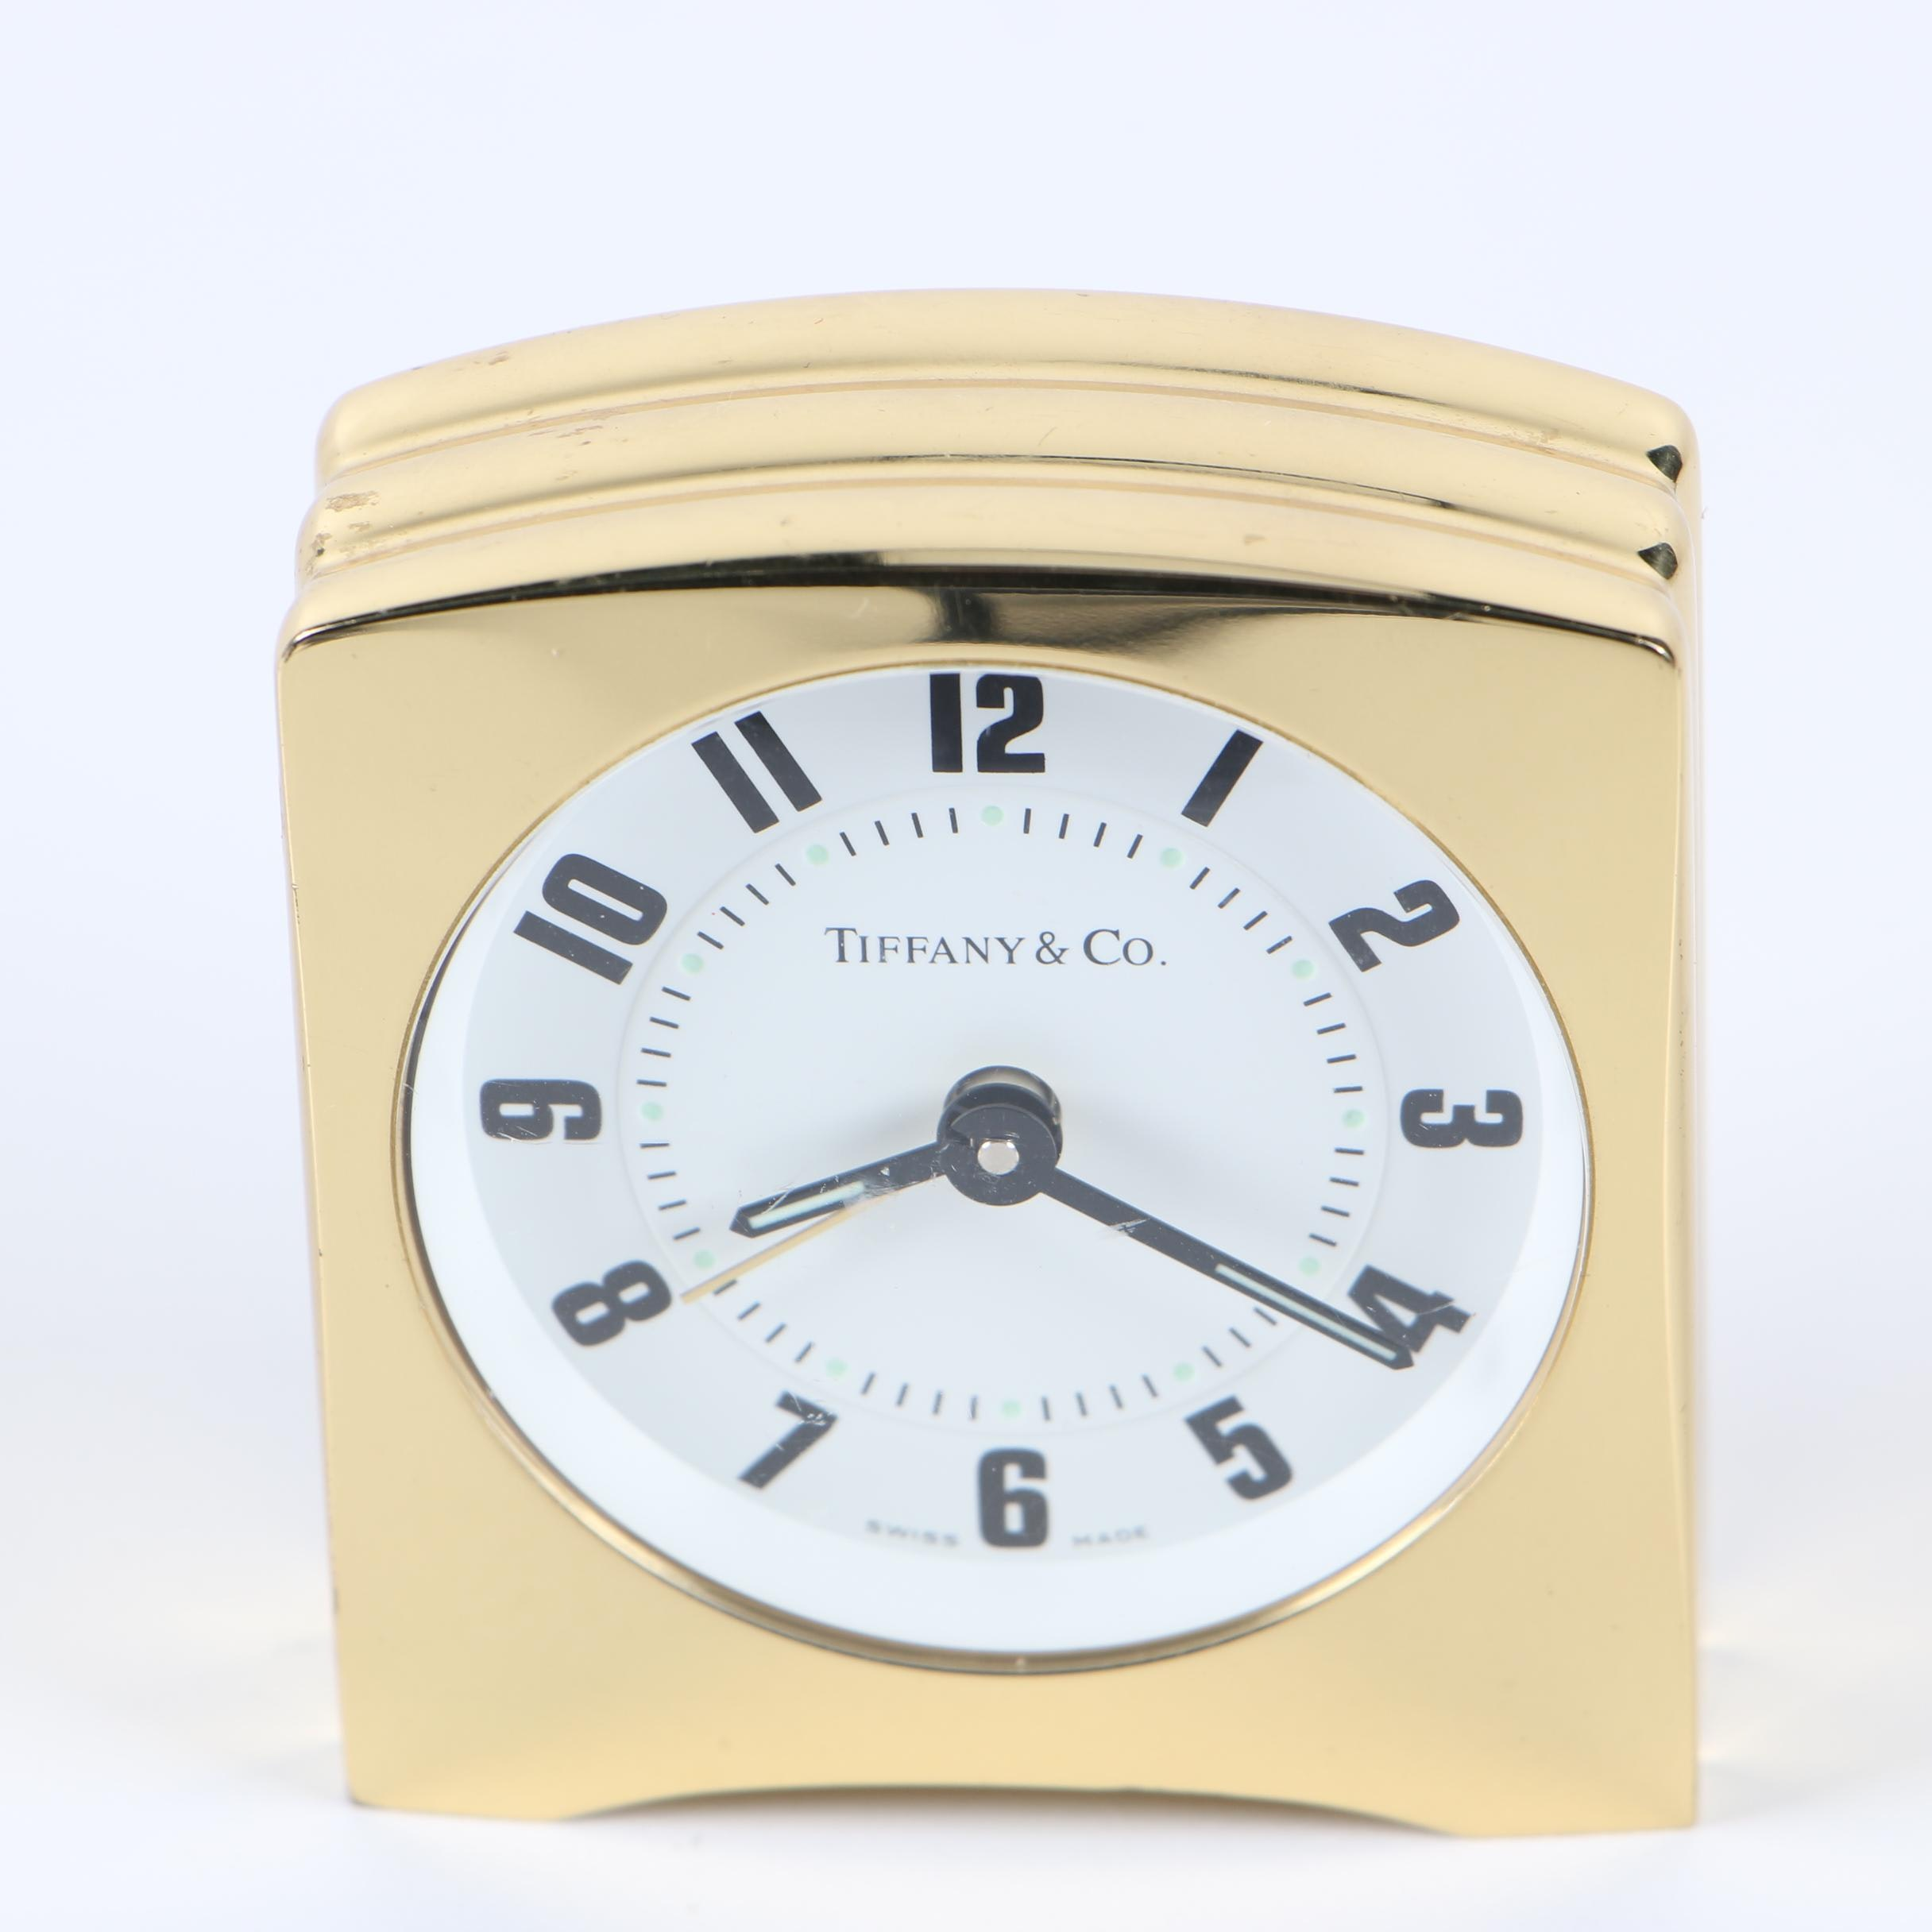 Tiffany & Co. Swiss Made Gold Tone Alarm Clock